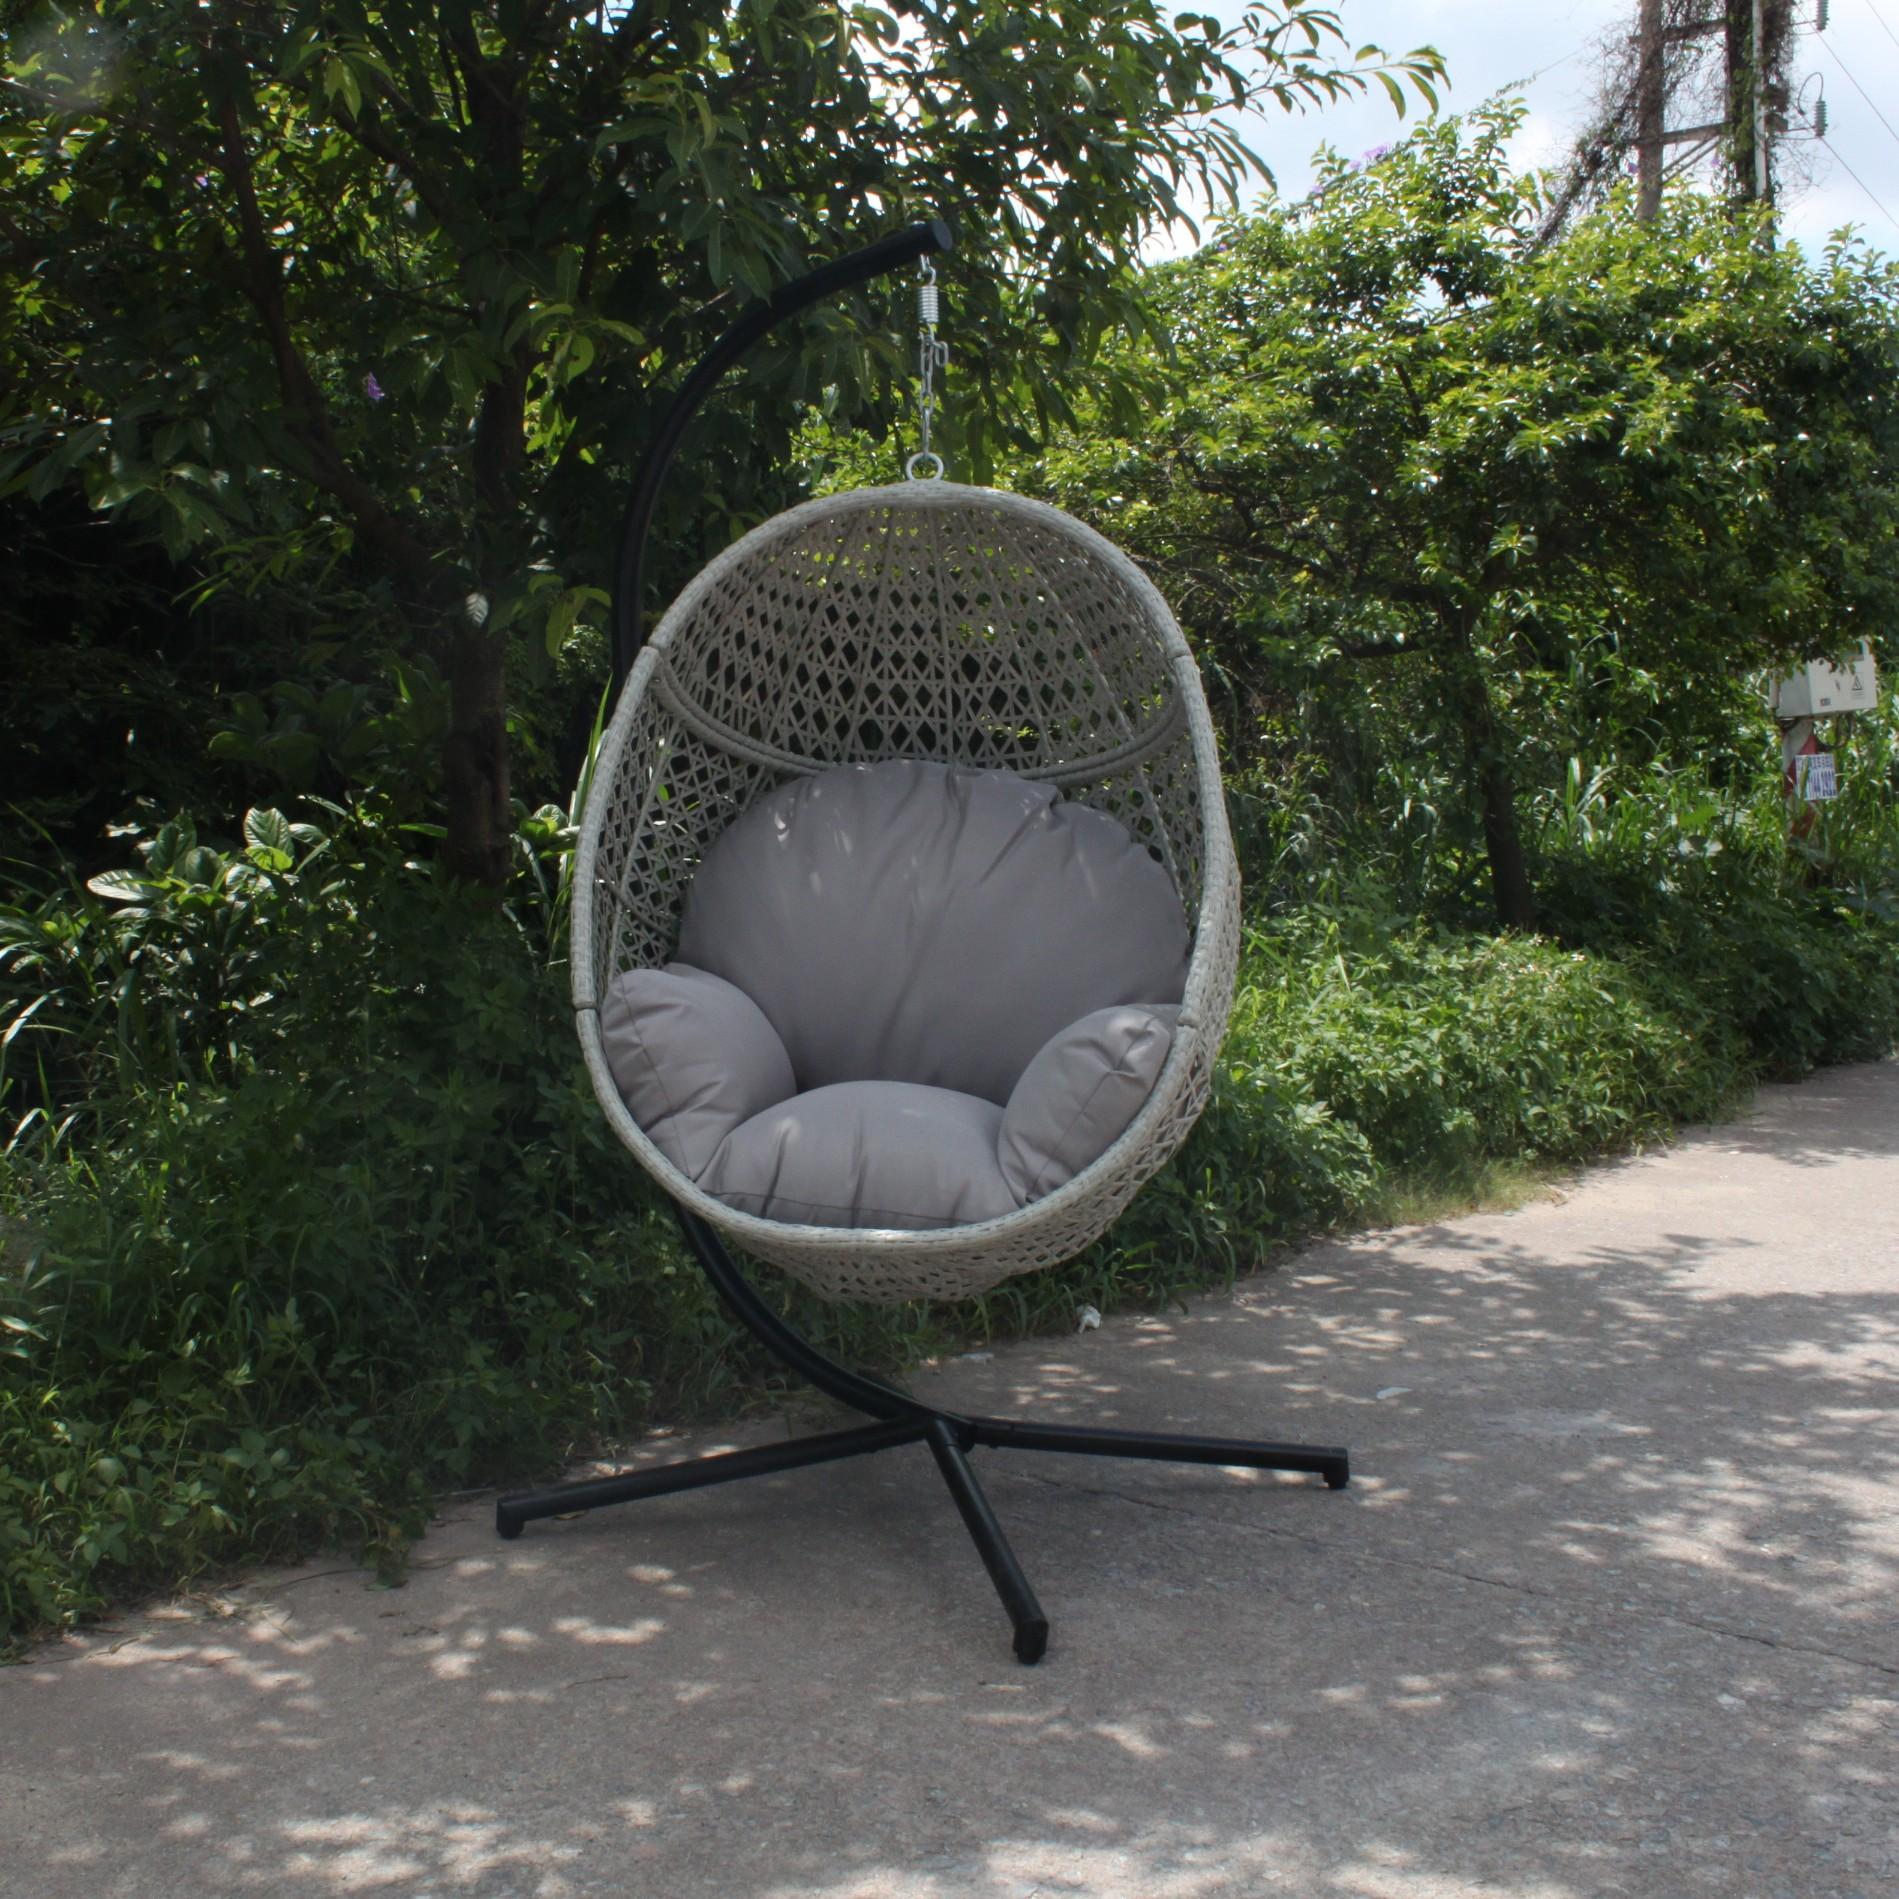 Best Sale Garden Egg Swing Chair Manufacturers, Best Sale Garden Egg Swing Chair Factory, Supply Best Sale Garden Egg Swing Chair